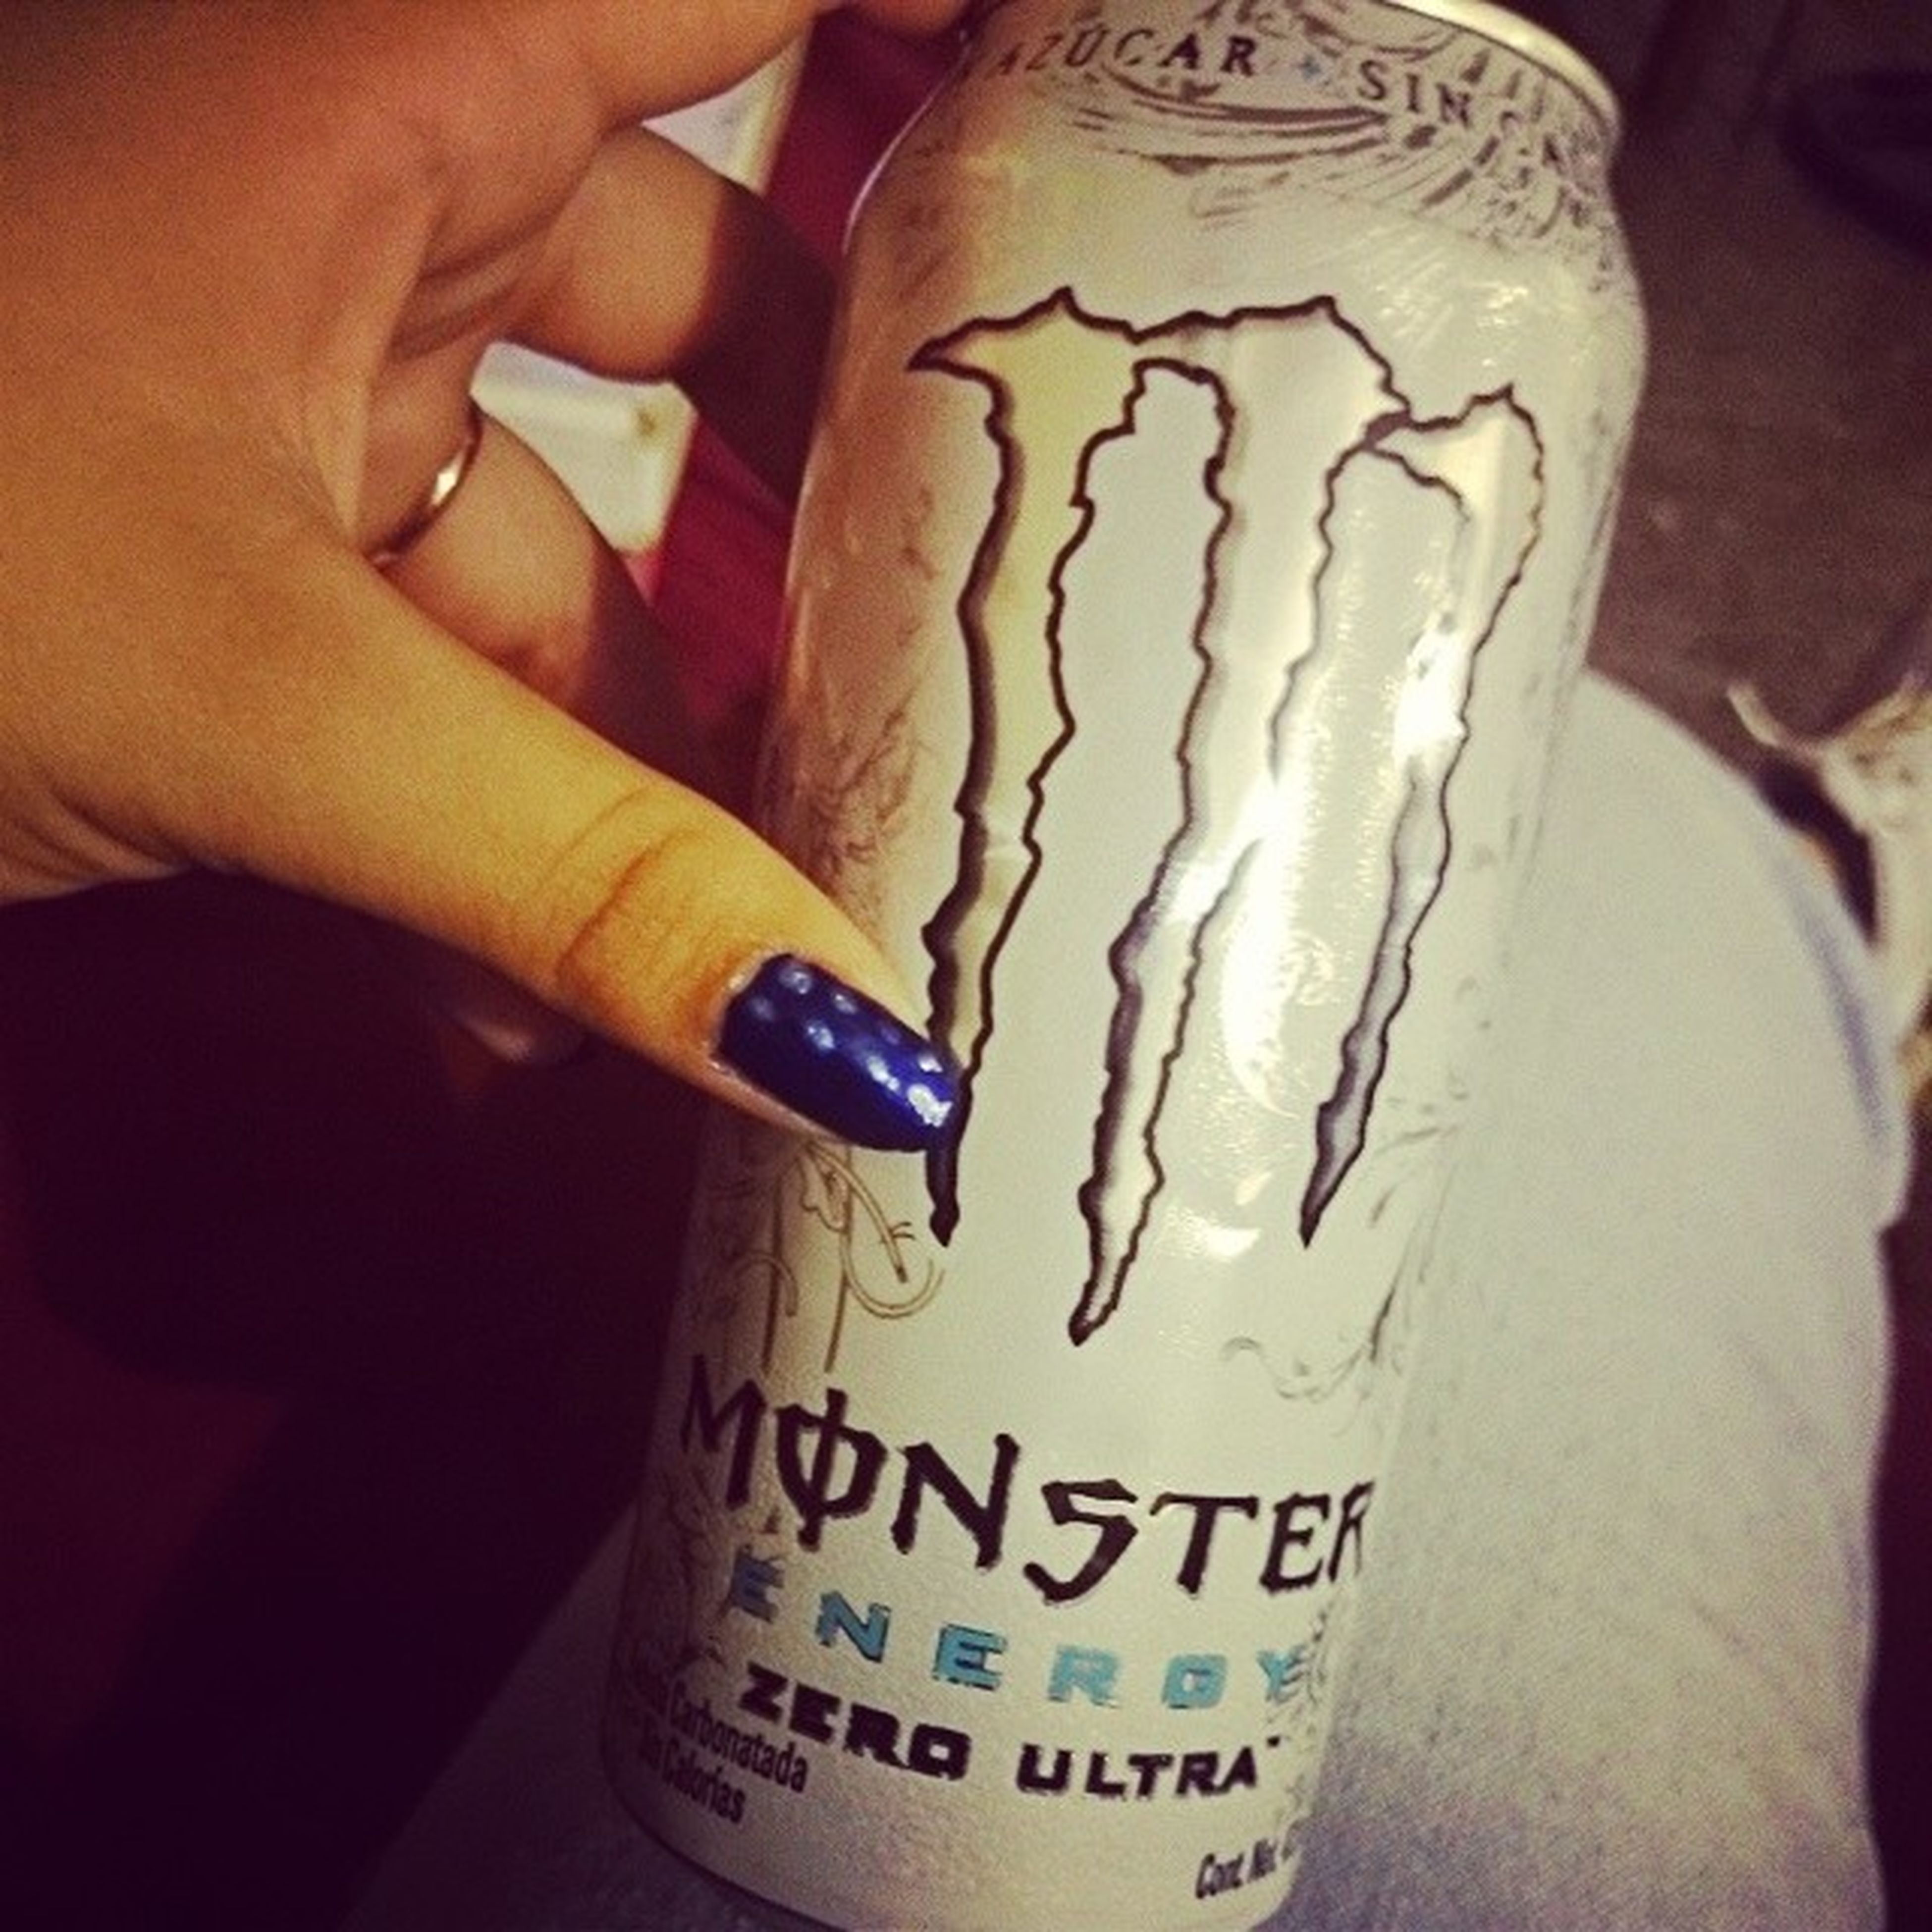 Monster . Energye . Paseleporlascocas xD JAJAJA